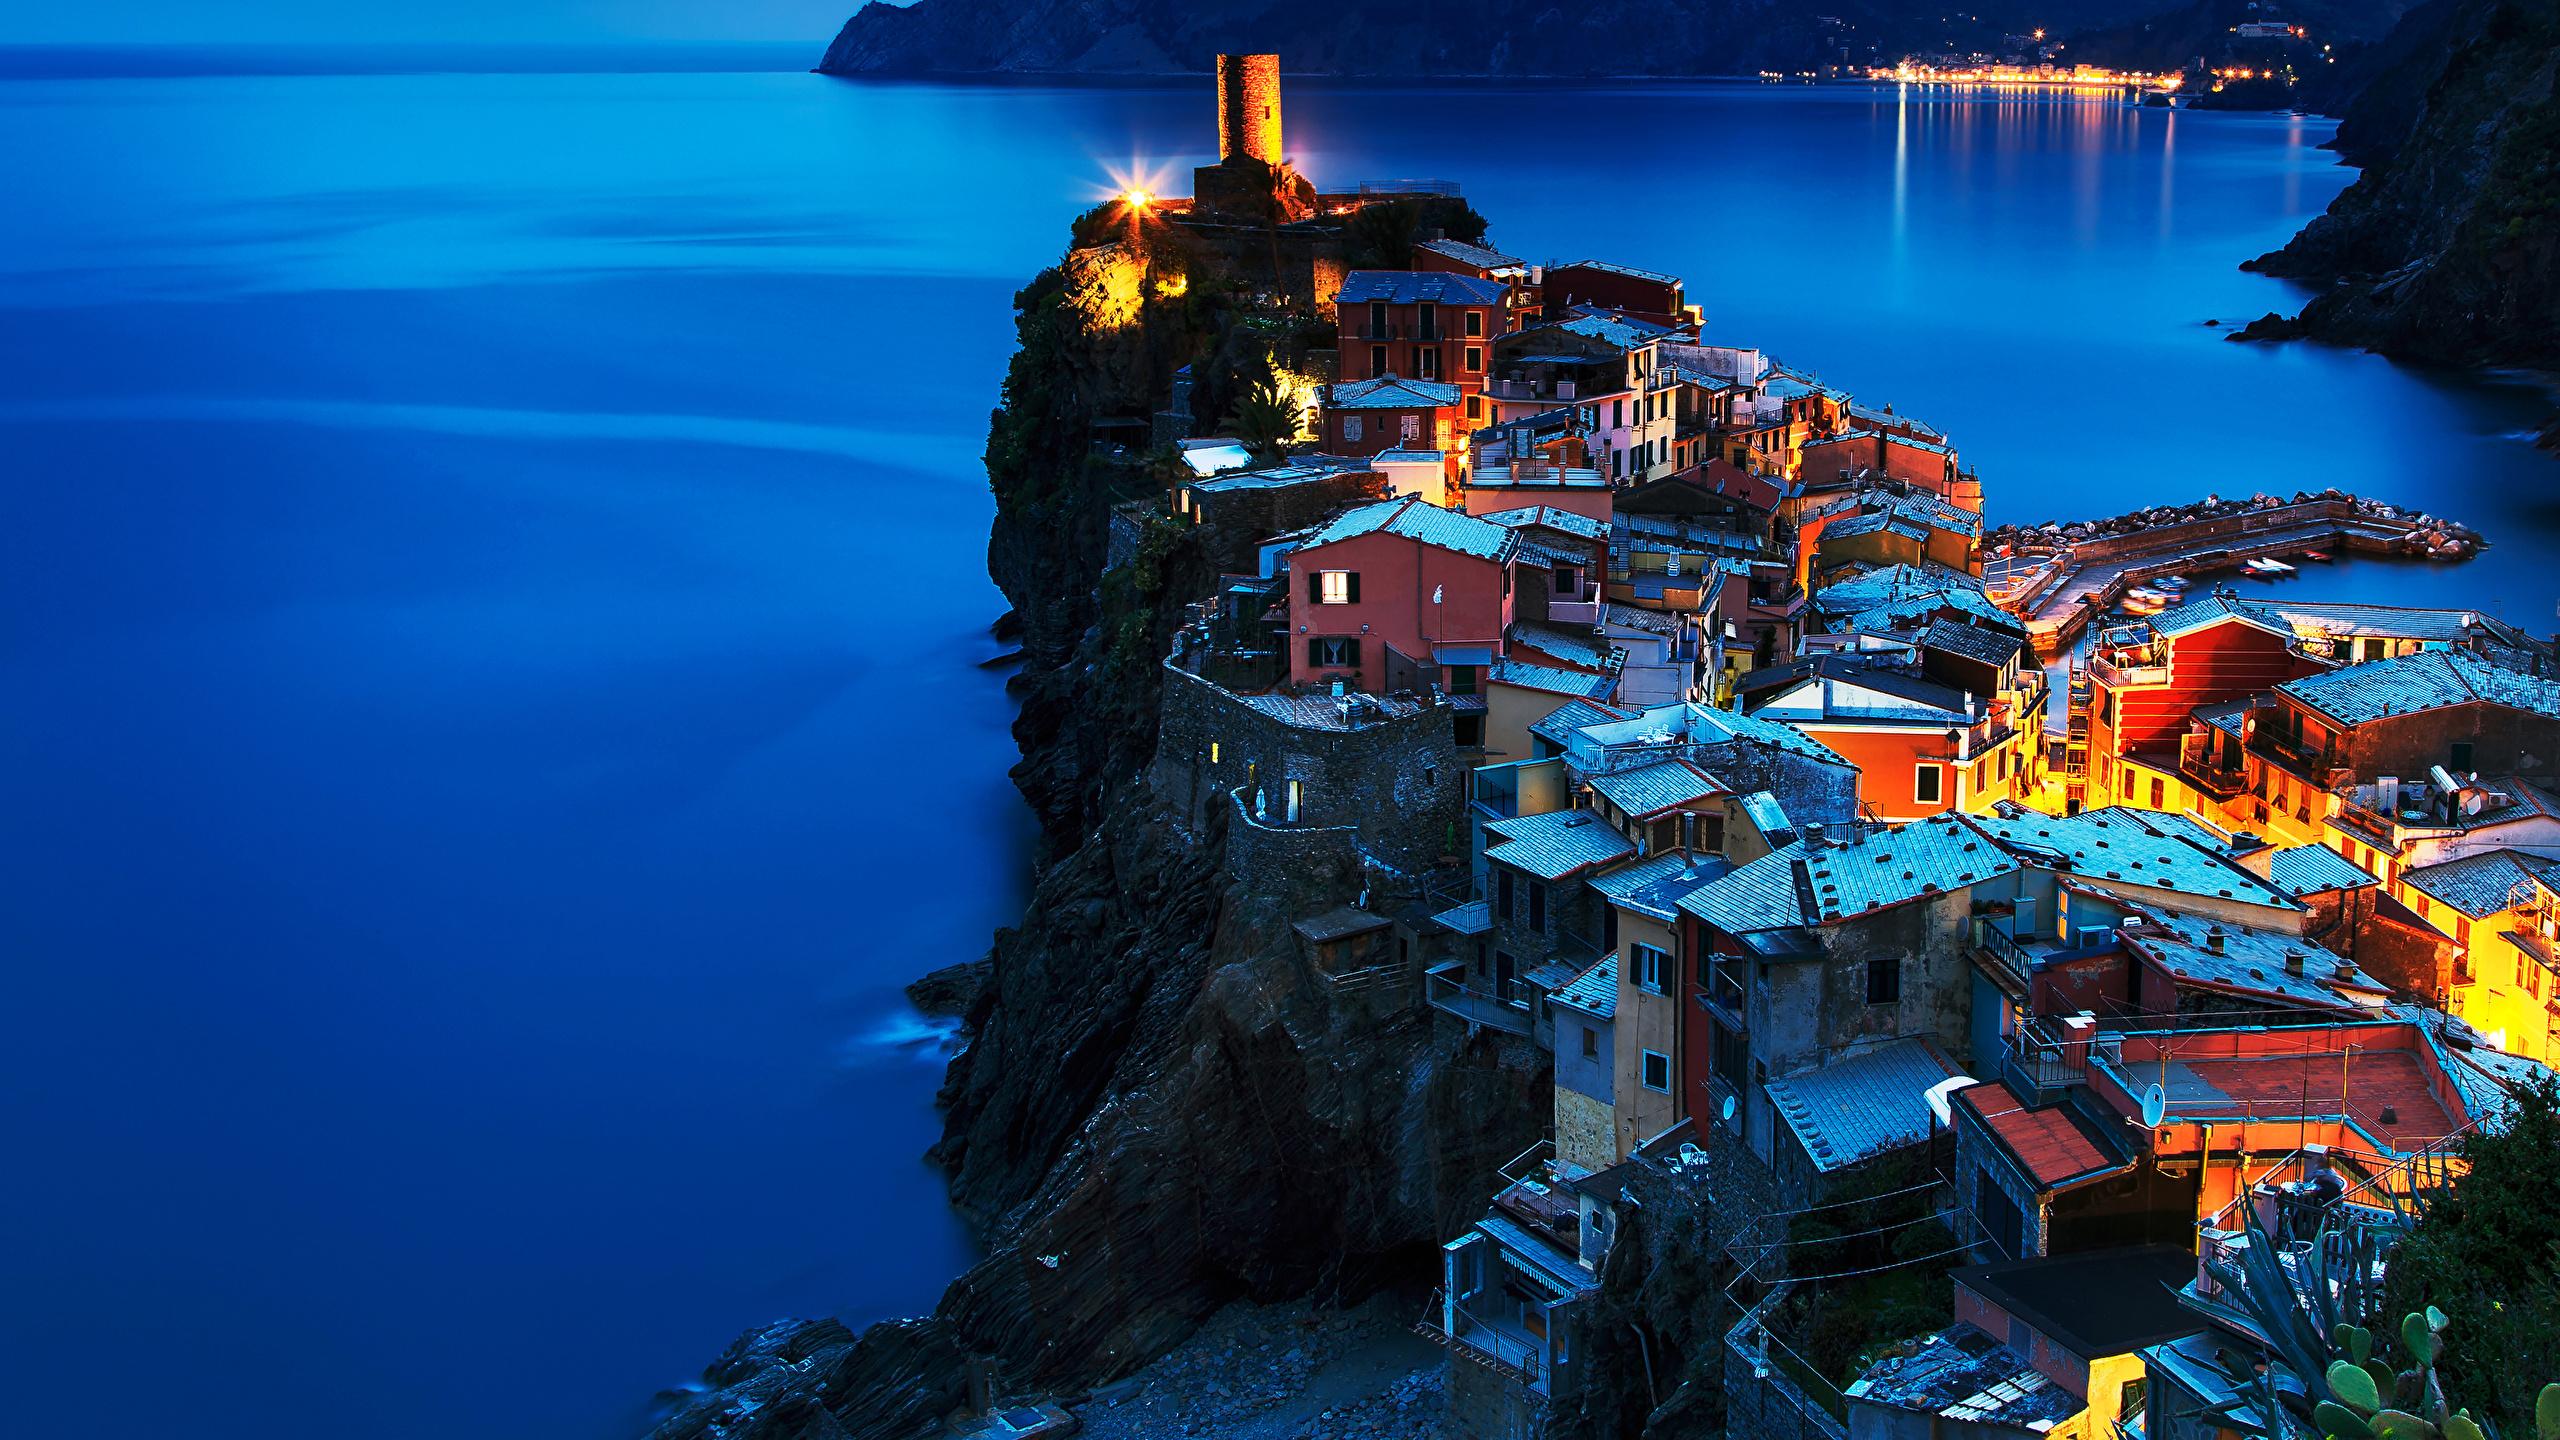 Pictures Vernazza Cinque Terre park Italy Rock Coast night 2560x1440 2560x1440